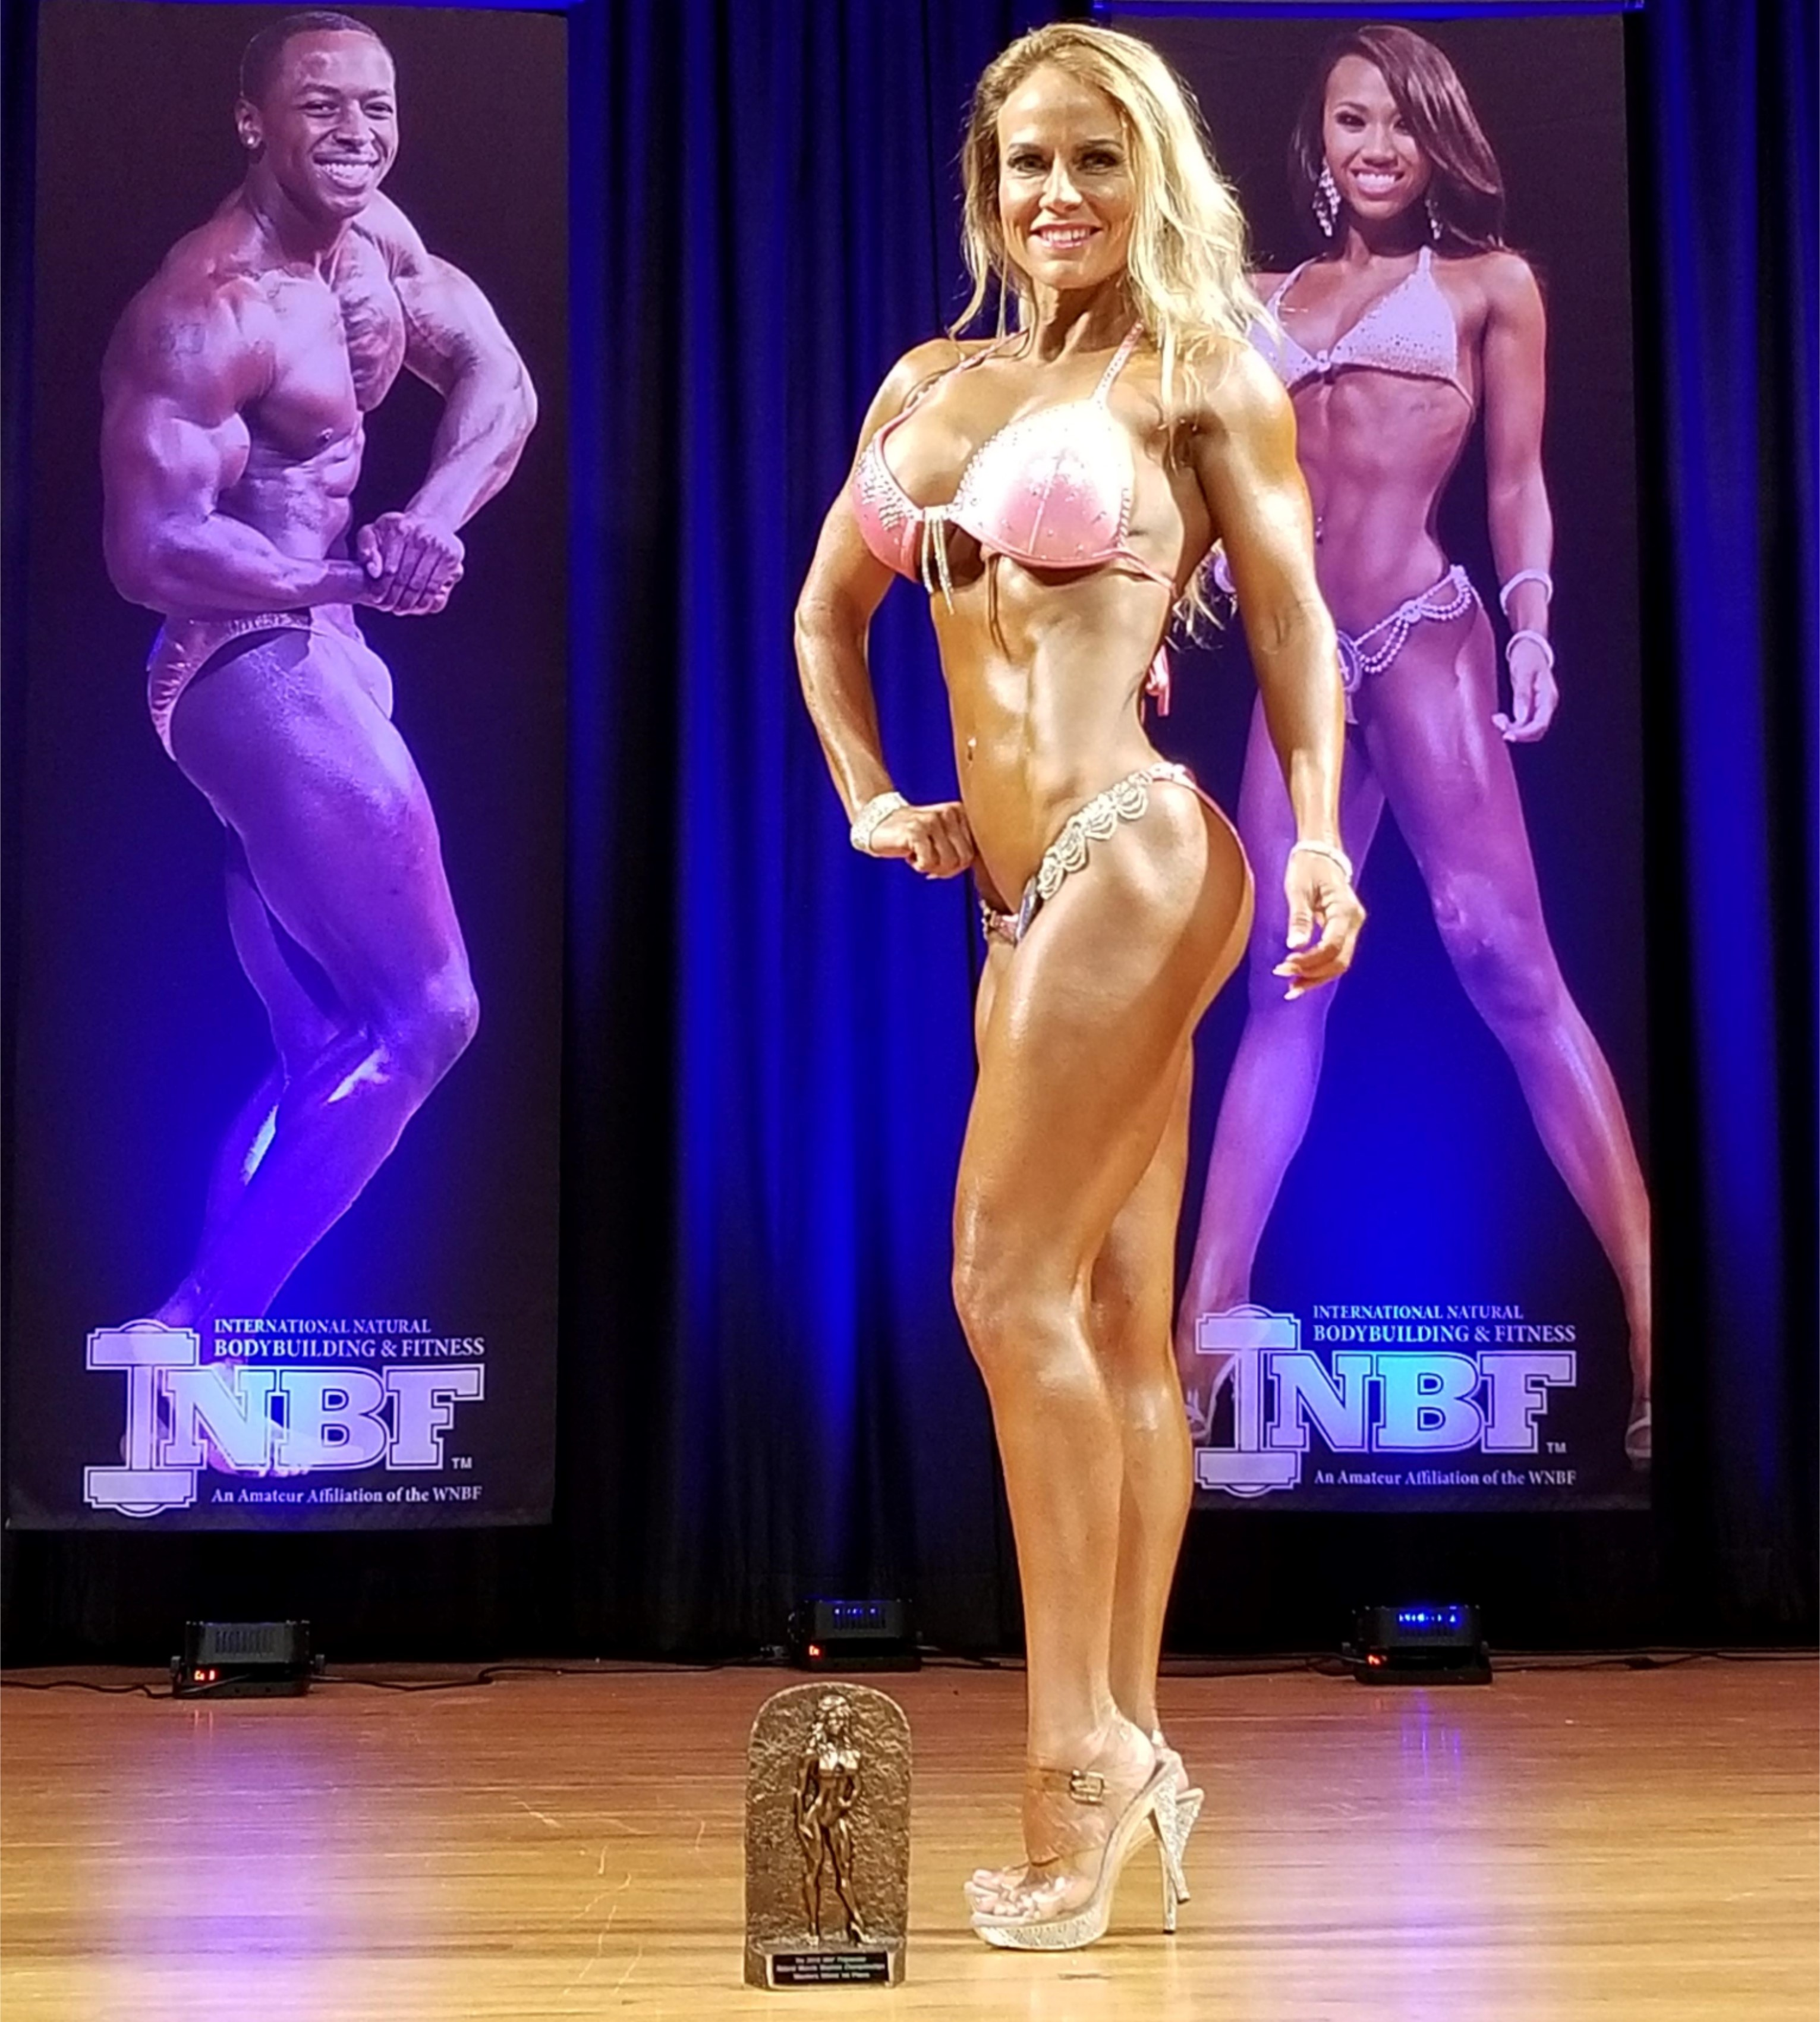 Heather Rosario Bikini Champion INBF Polynesian Natural Muscle Mayhem WNBF Pro Qualifier Hi Fit Expo Oahu Hawaii